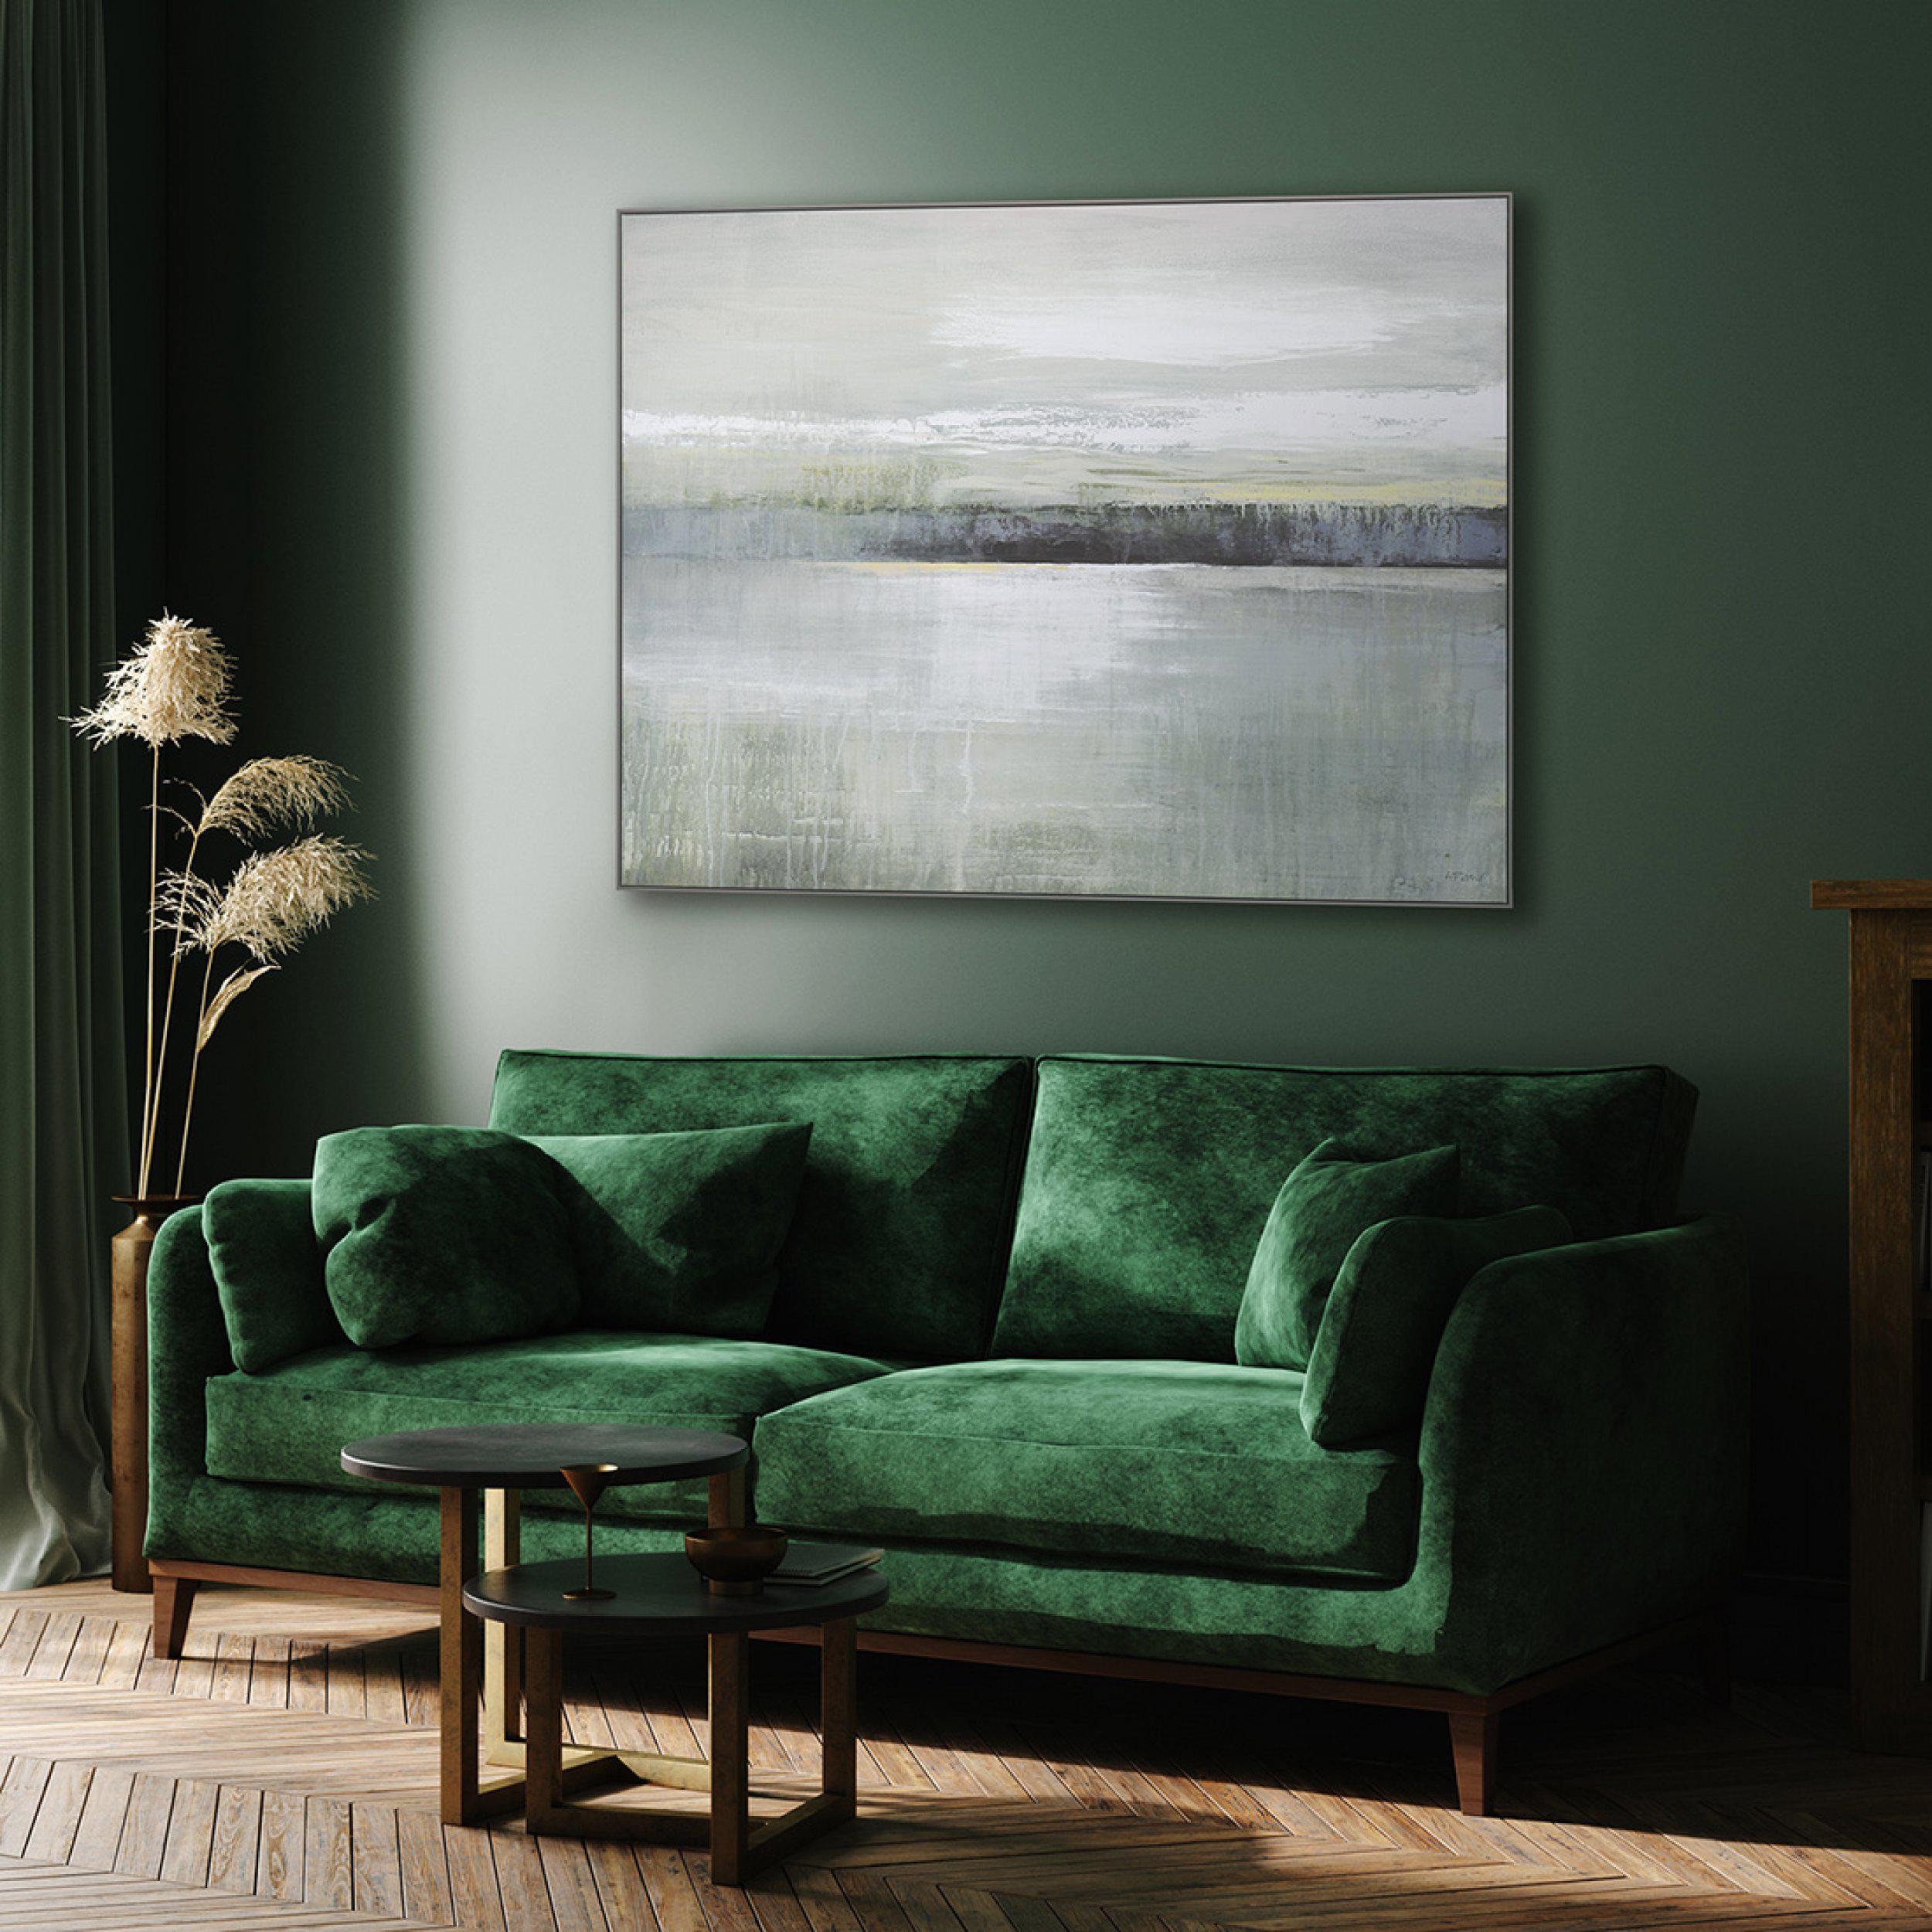 Art Gallery - Olive - Painting by Artist Adelene Fletcher - Framed Print For Sale - Room Display